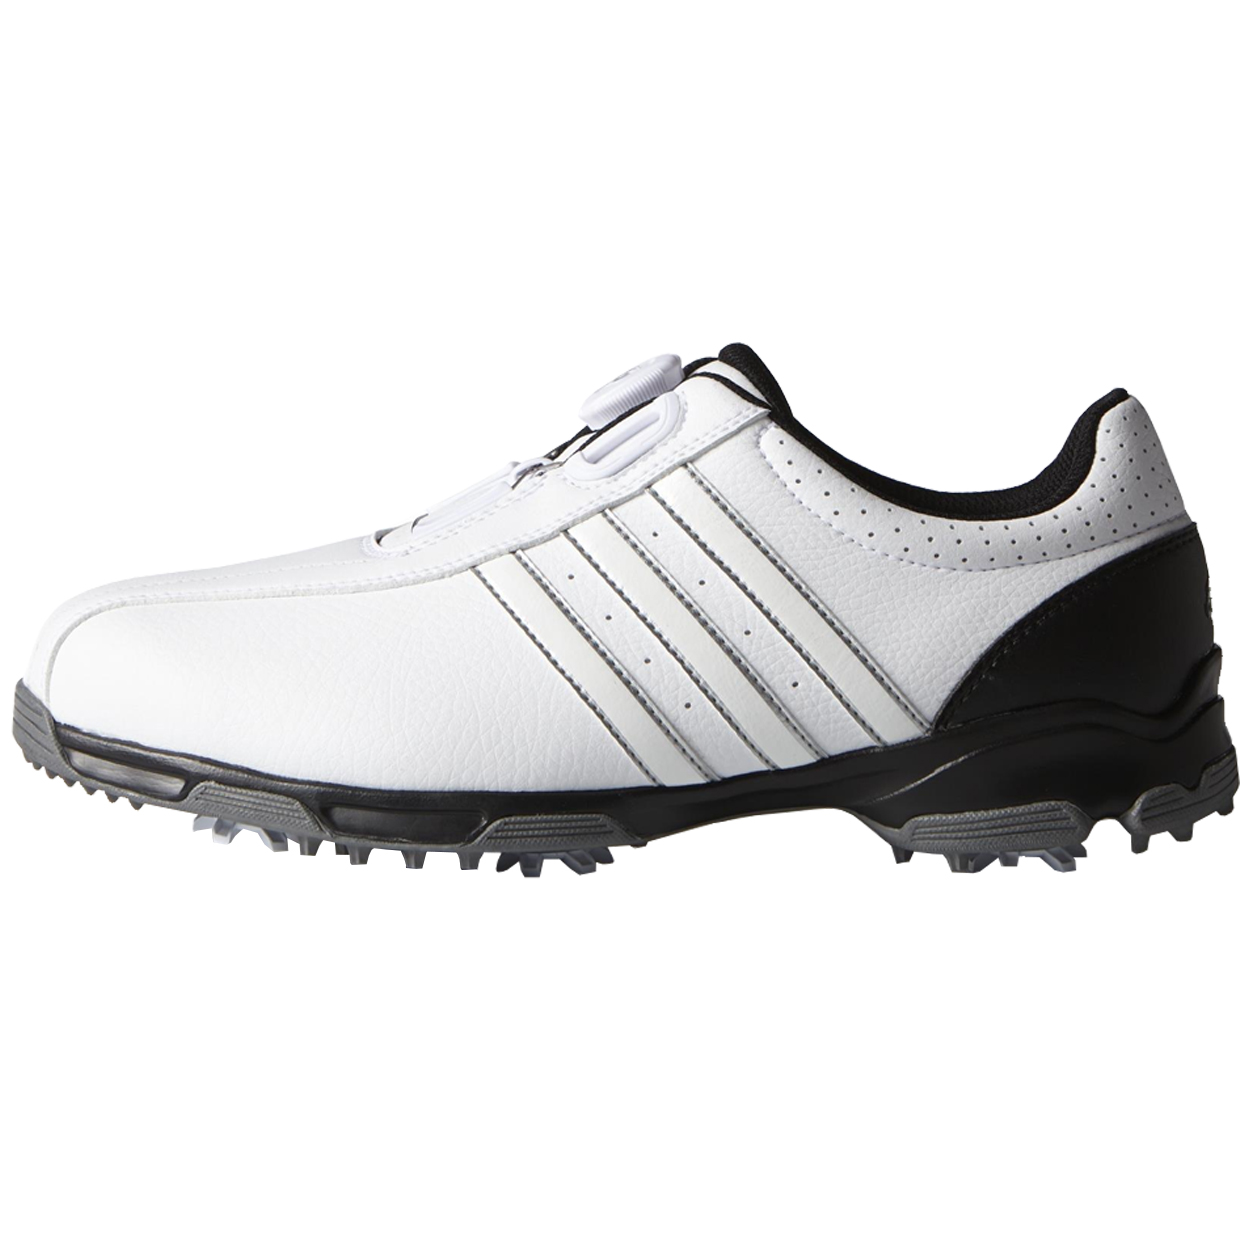 huge discount 7f3a3 f388e Adidas 360 Traxion Boa Golf Shoes